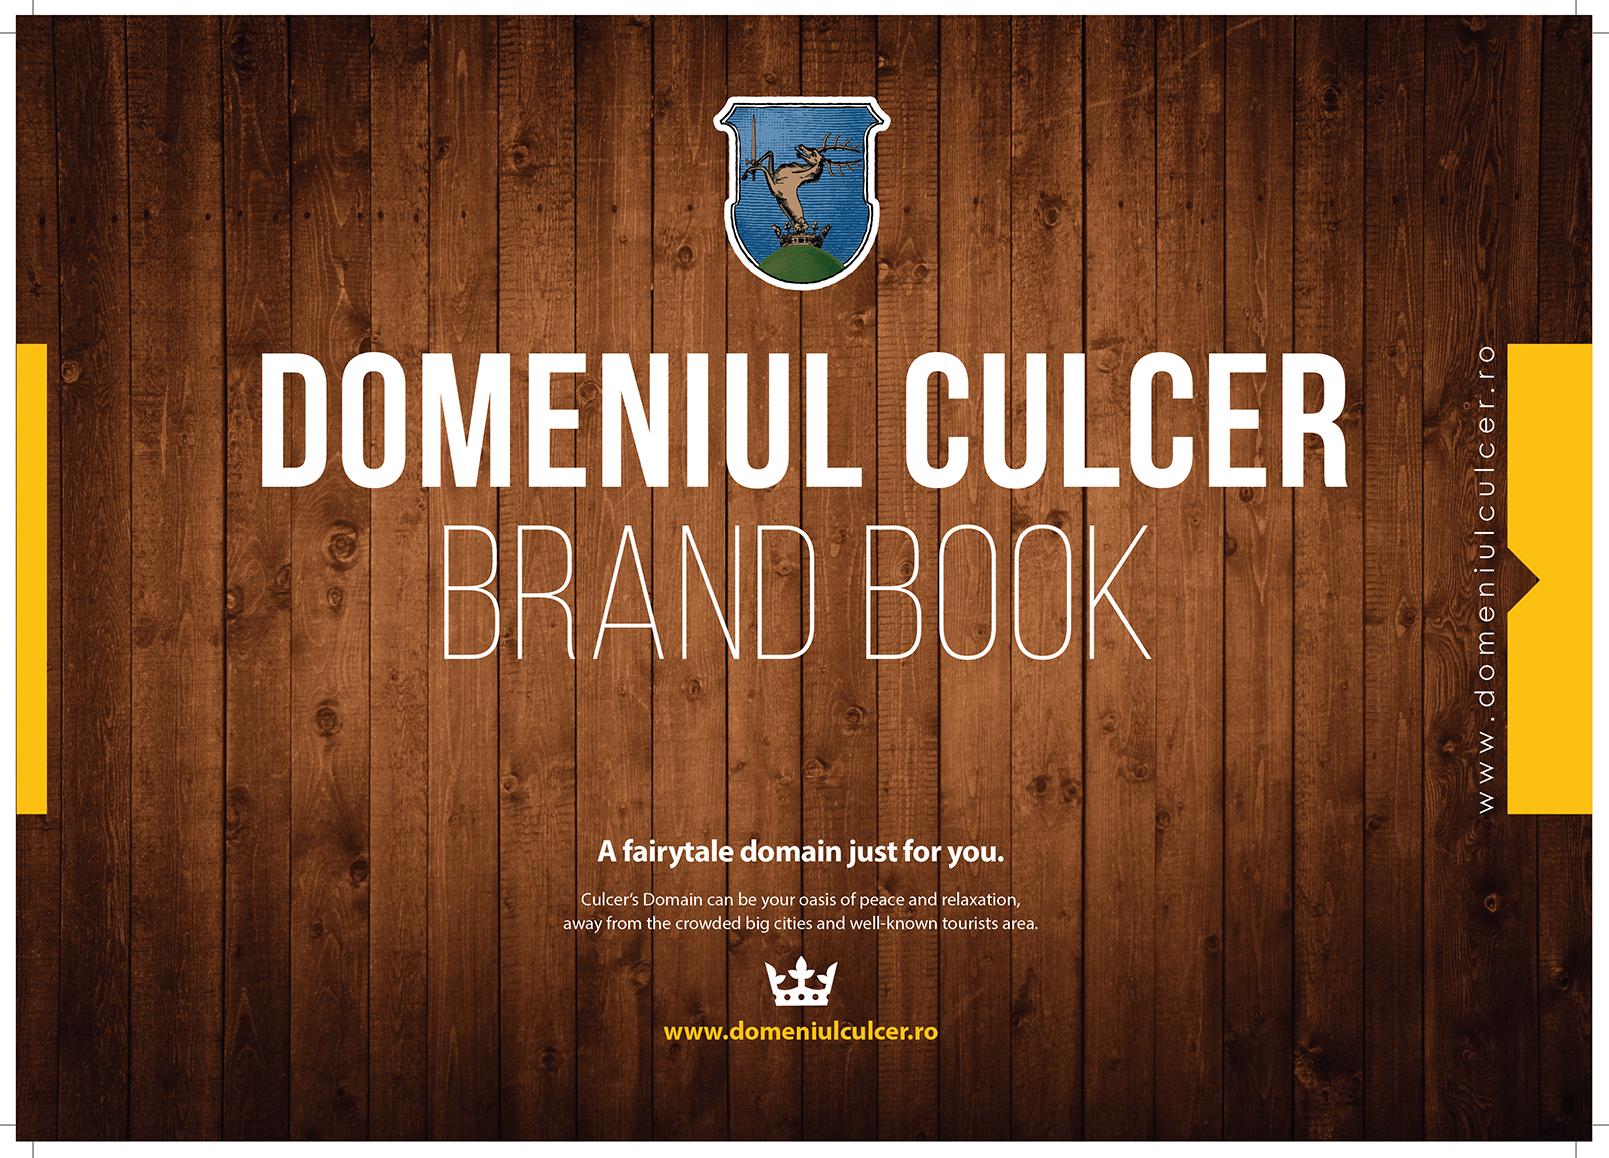 BRAND BOOK DOMENIUL CULCER-01